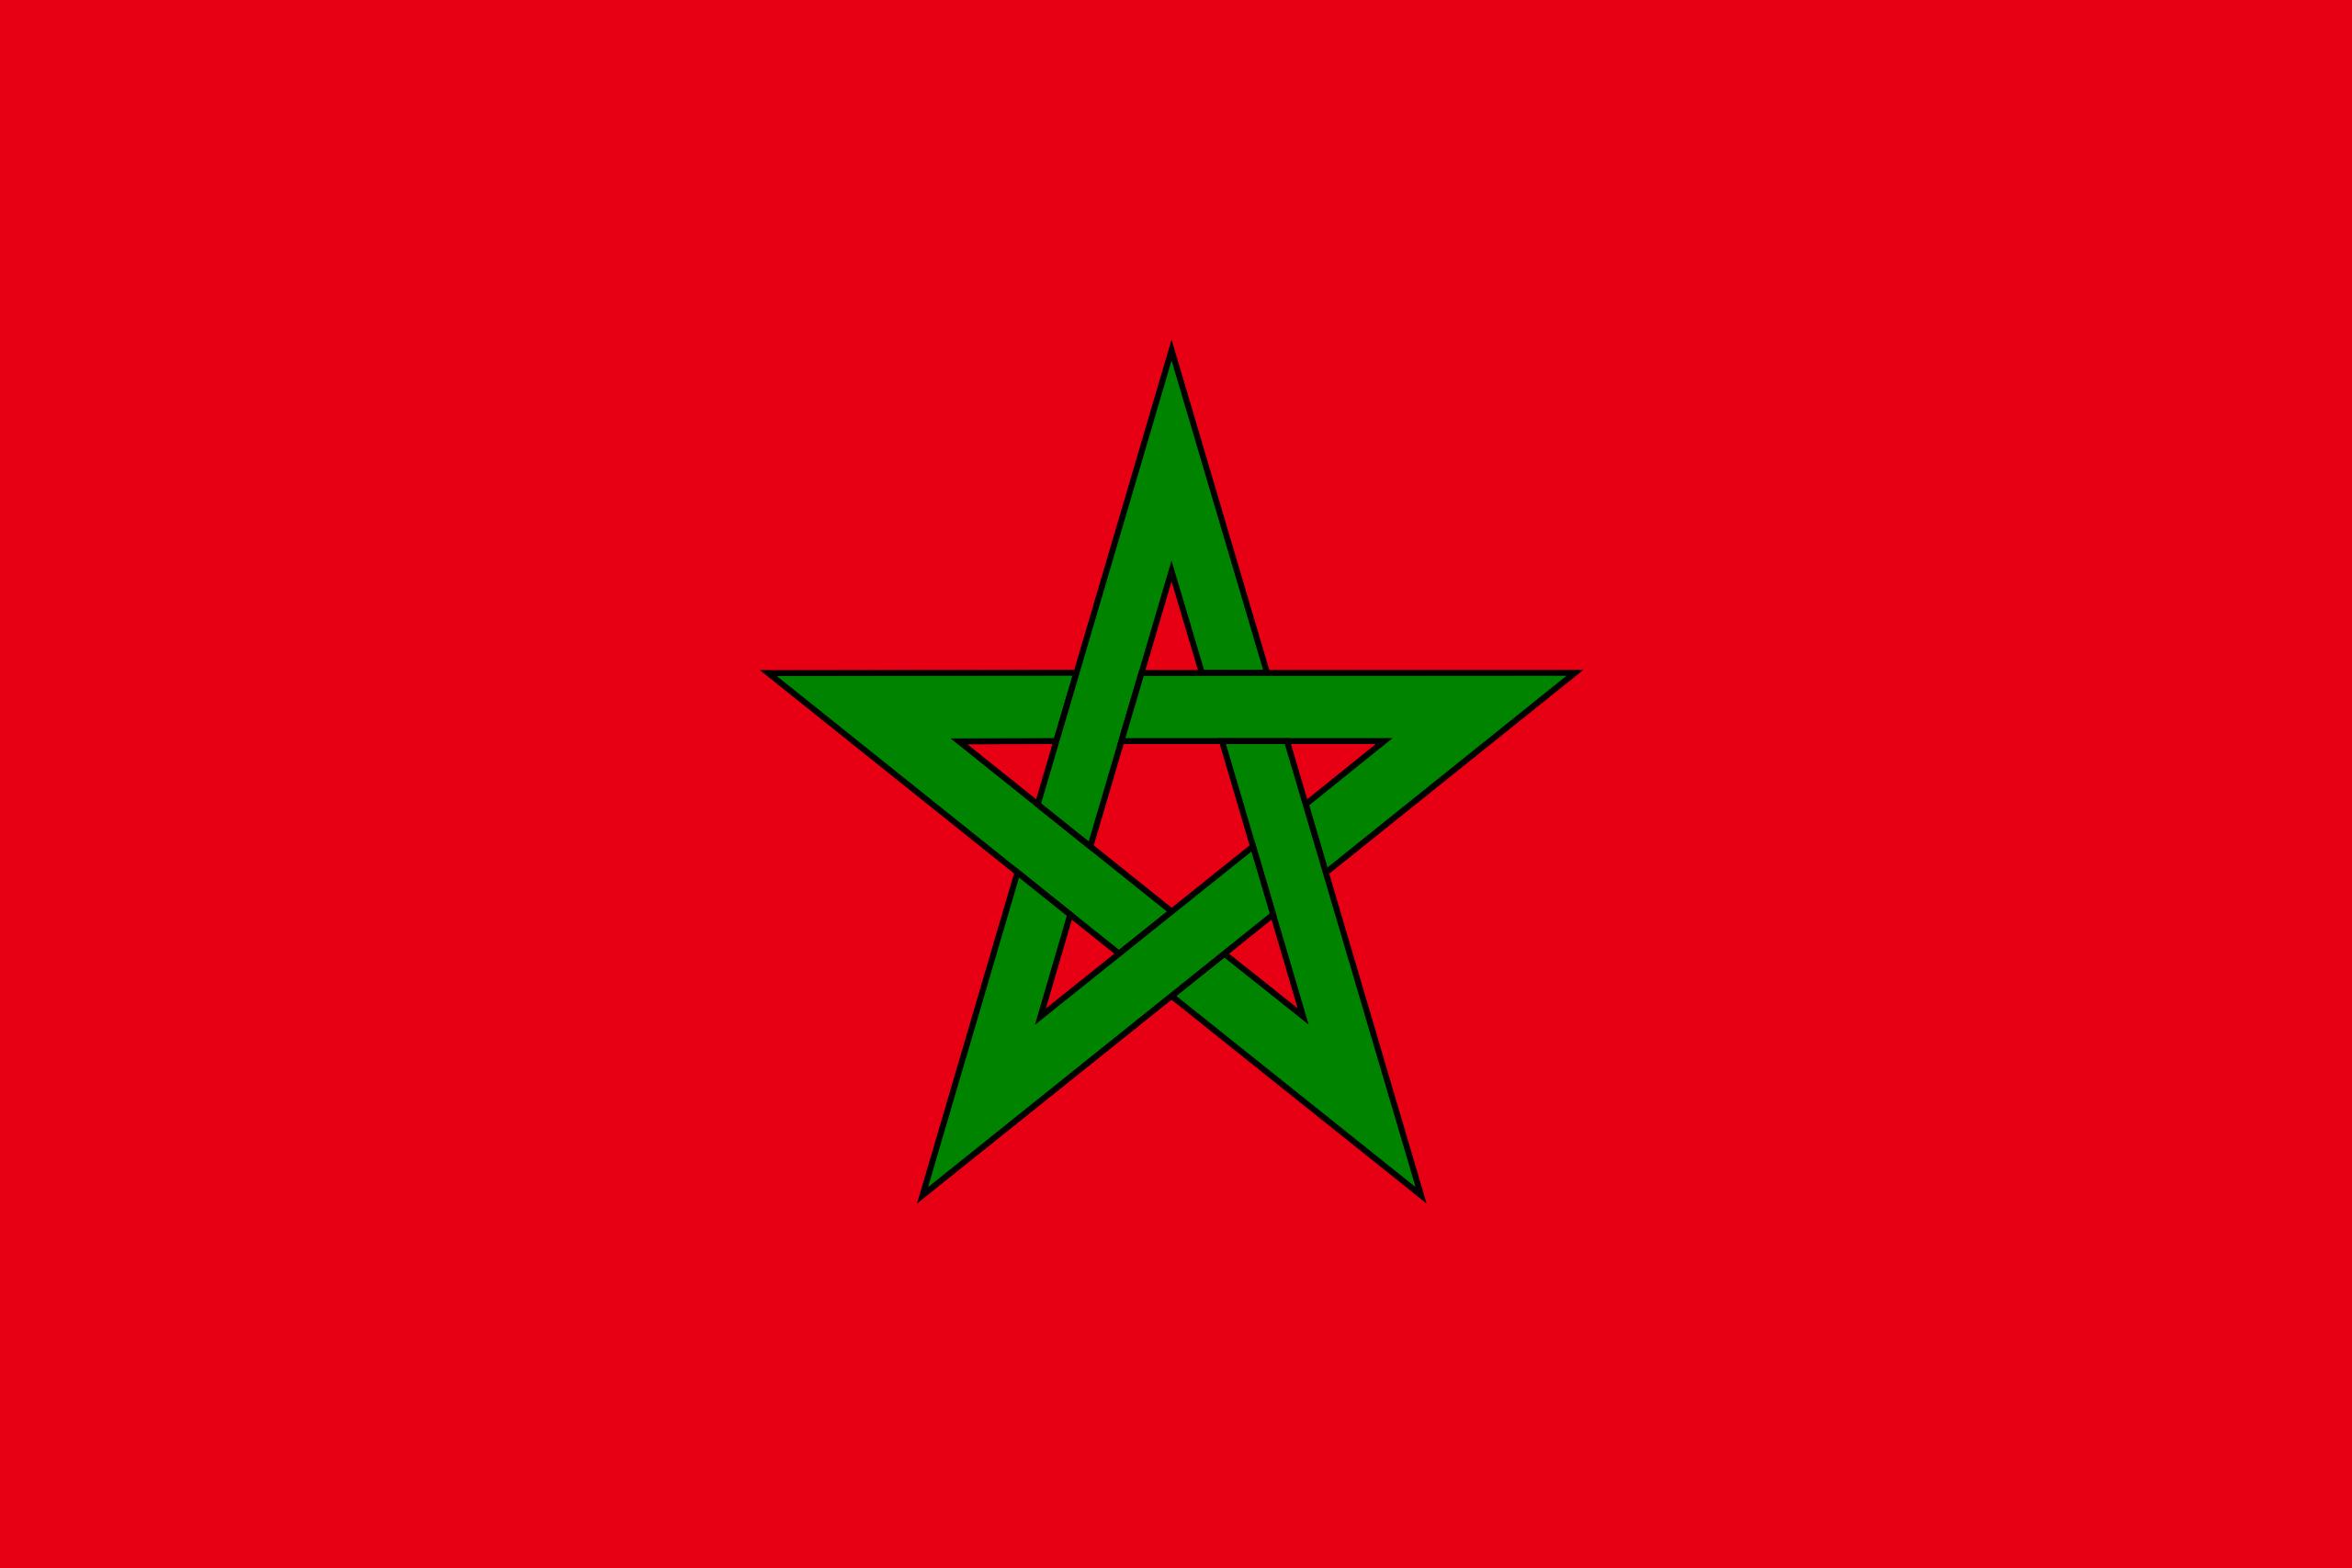 Marokko, Land, Emblem, Logo, Symbol - Wallpaper HD - Prof.-falken.com